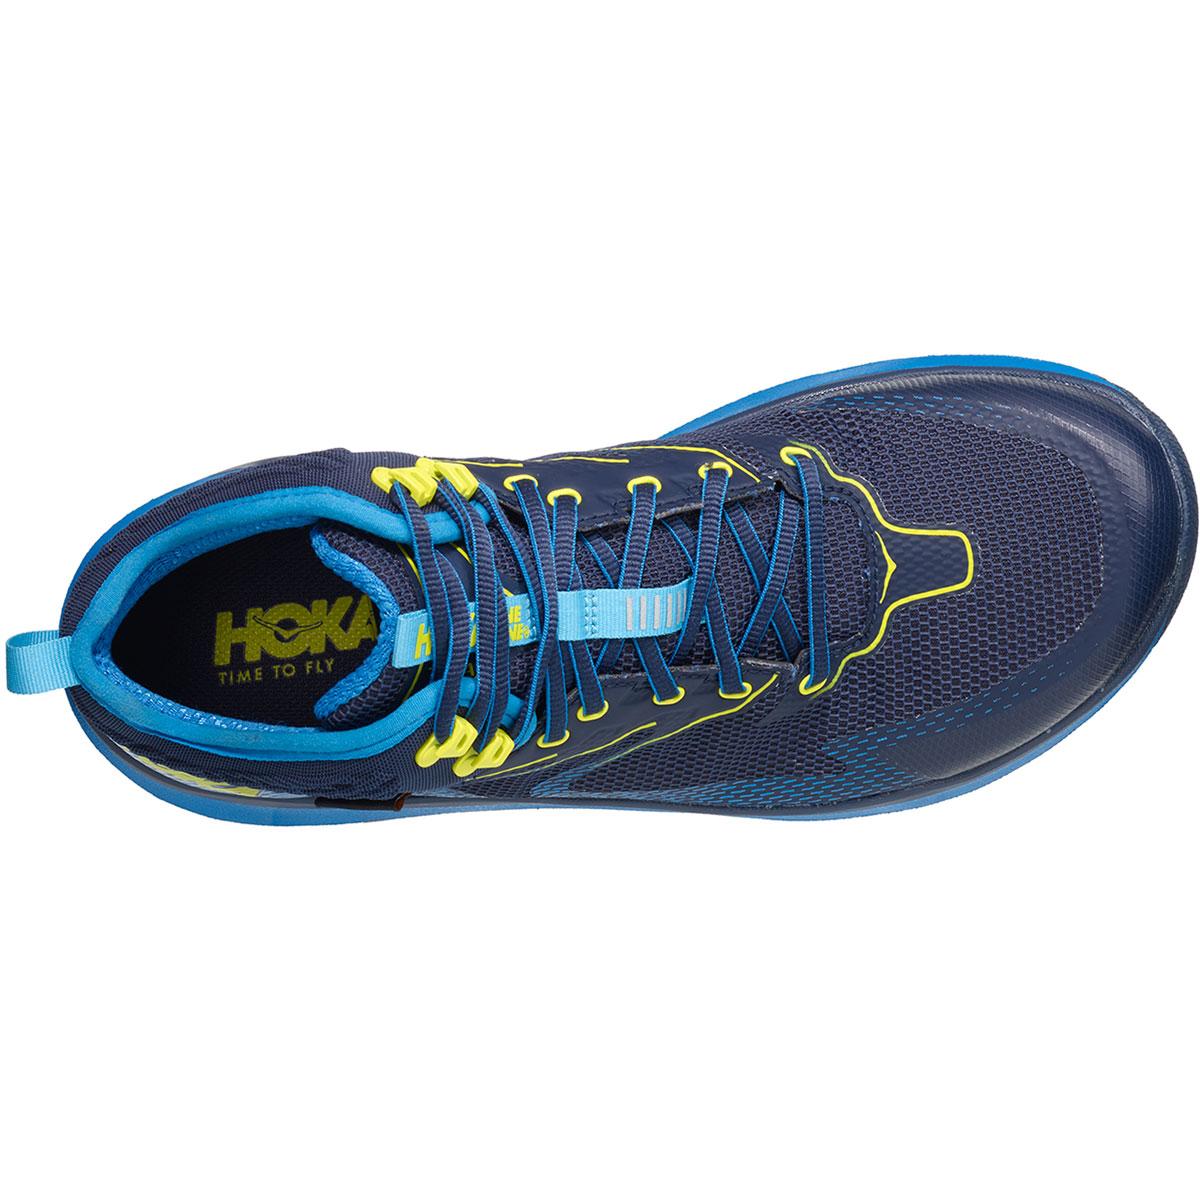 Men's Hoka One One Sky Toa Gore-Tex Trail Running Shoe - Color: Black Iris/Blue - Size: 7 - Width: Regular, Black Iris/Blue, large, image 5